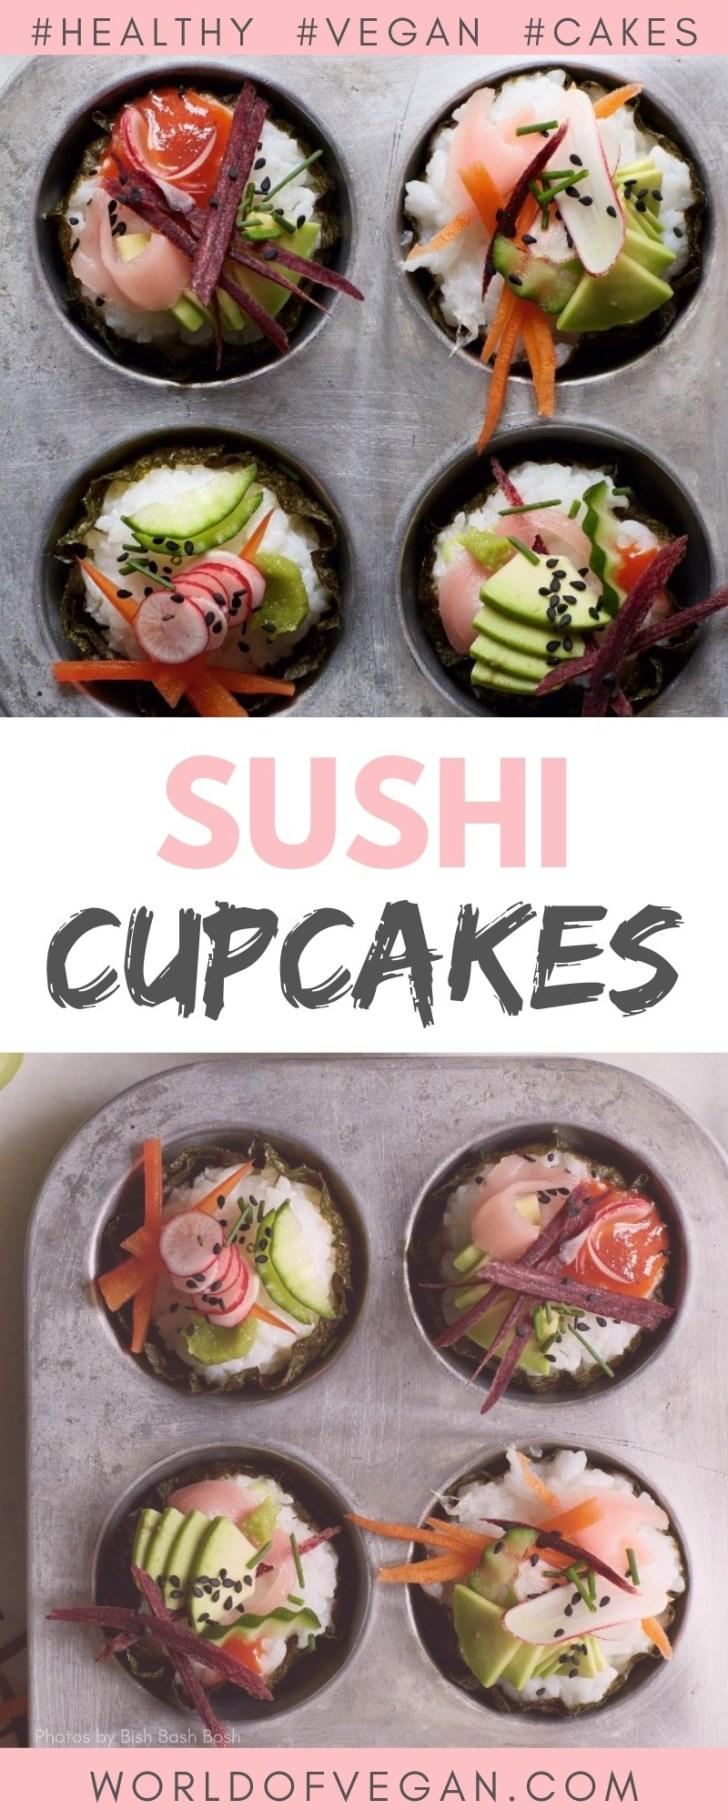 Easy Vegan Sushi Cupcakes   World of Vegan   #sushi #vegan #cupcakes #cakes #worldofvegan #appetizer #party